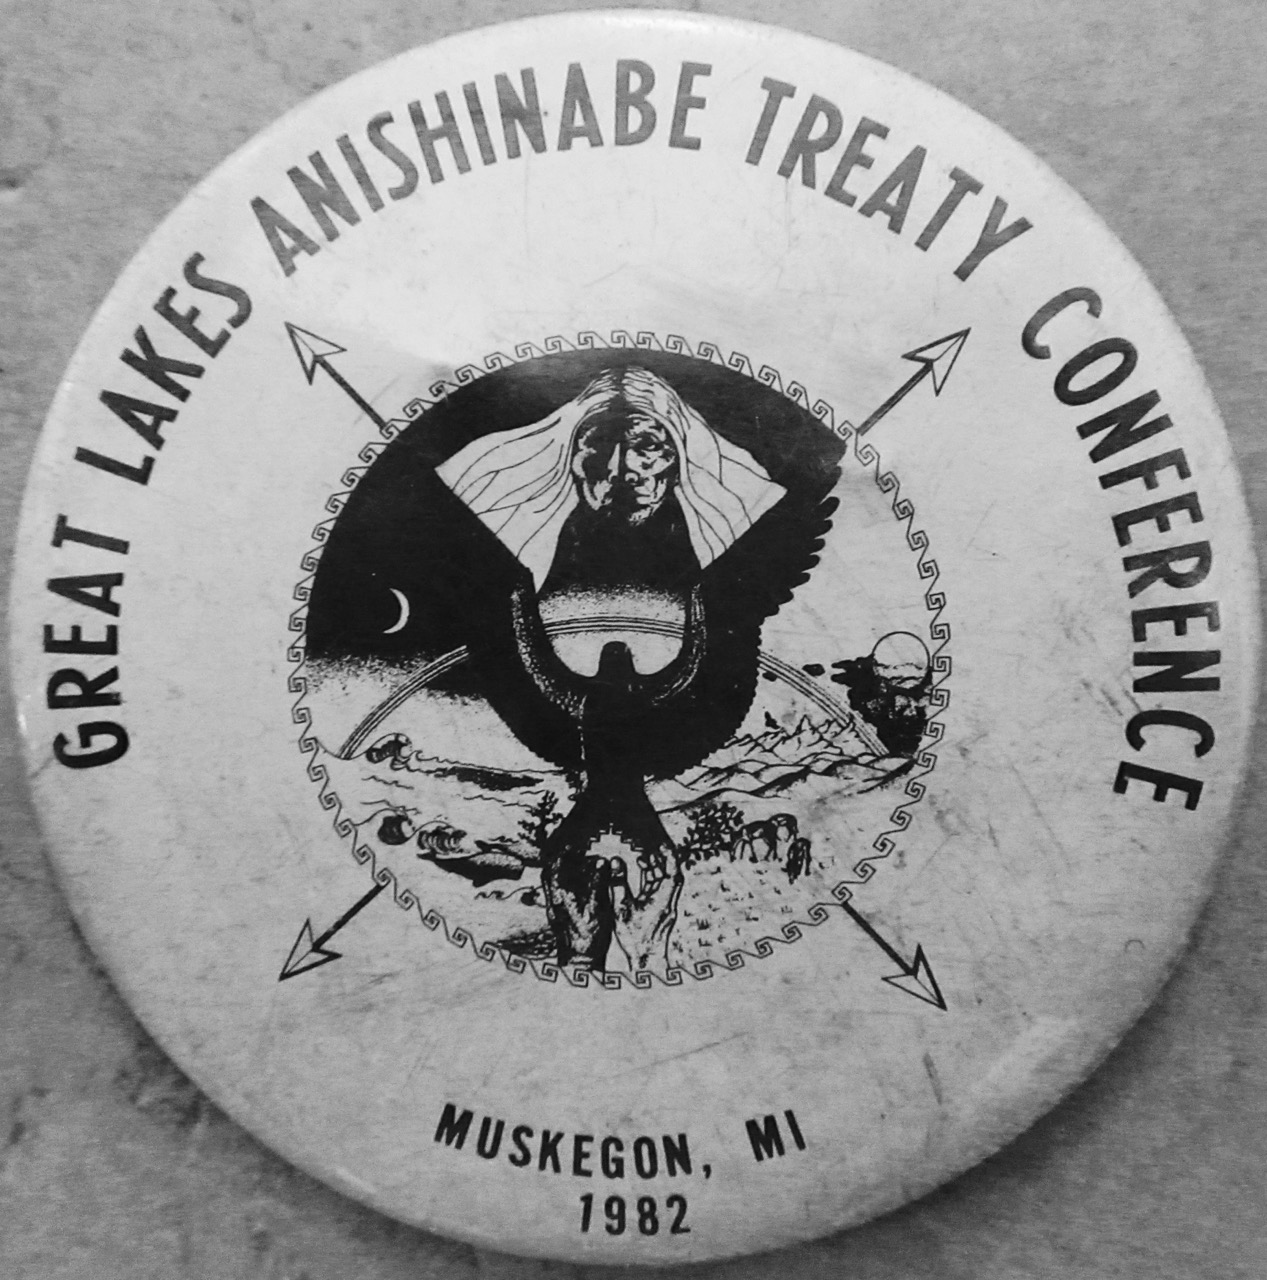 Anishinabe Treaty Conference